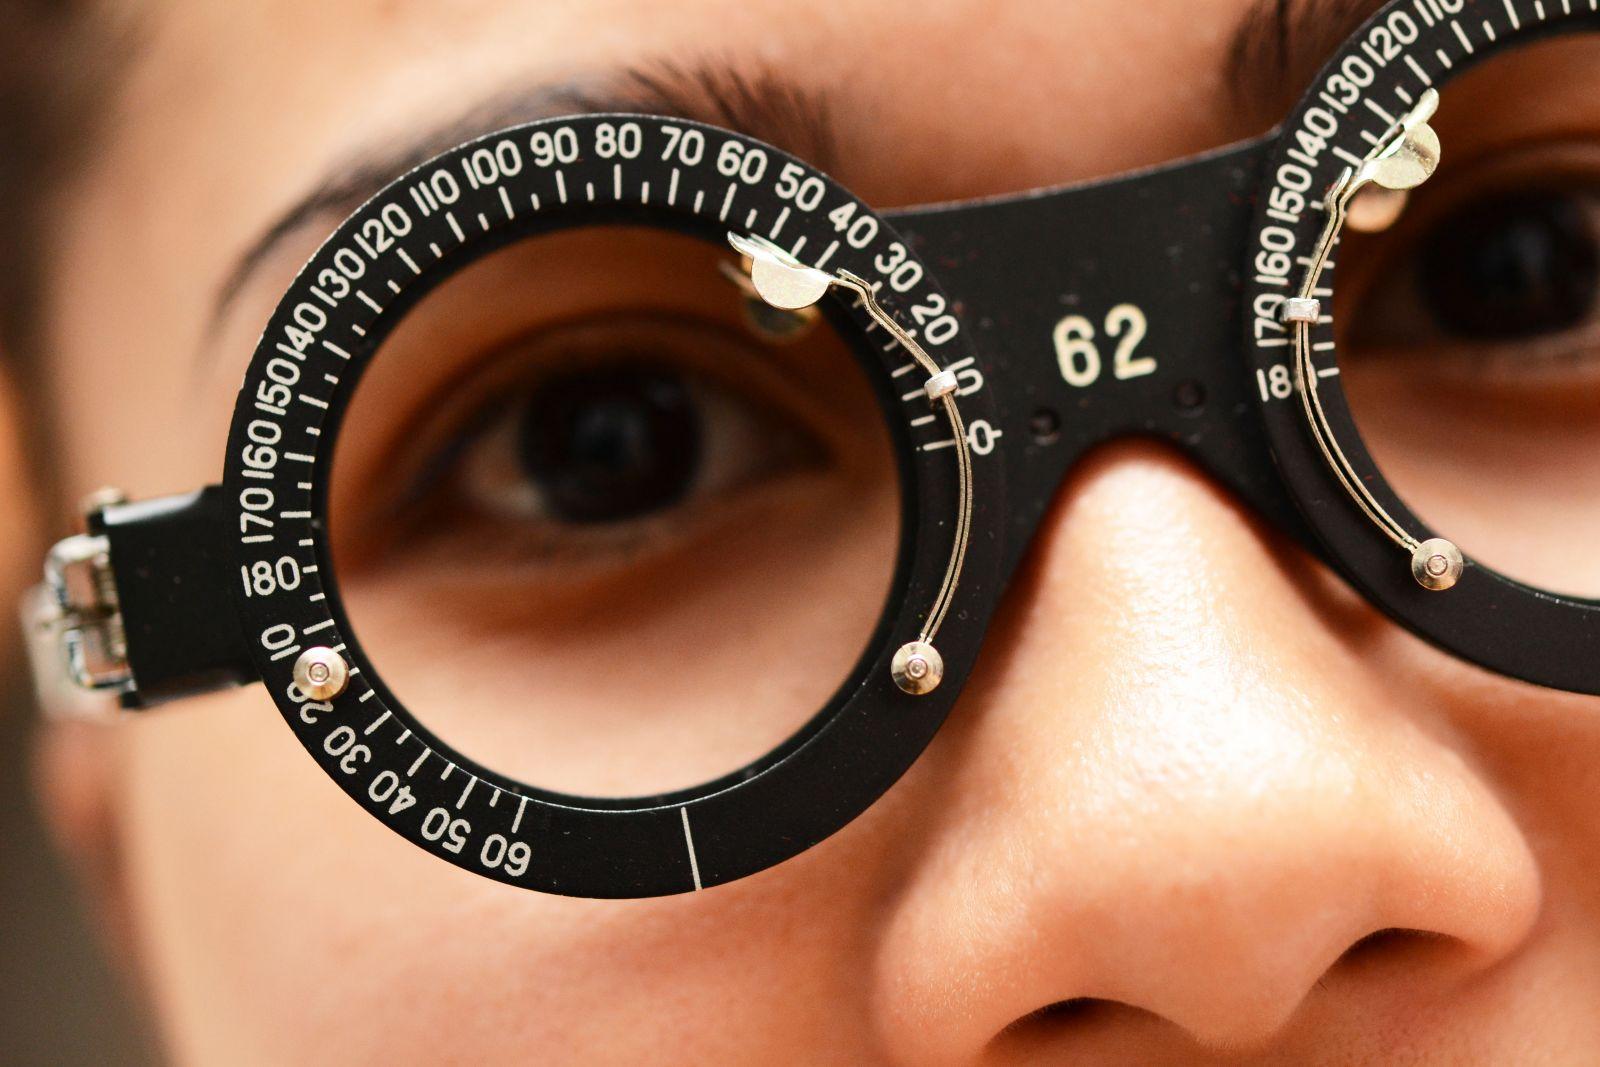 Ютуб практика восстановления зрения